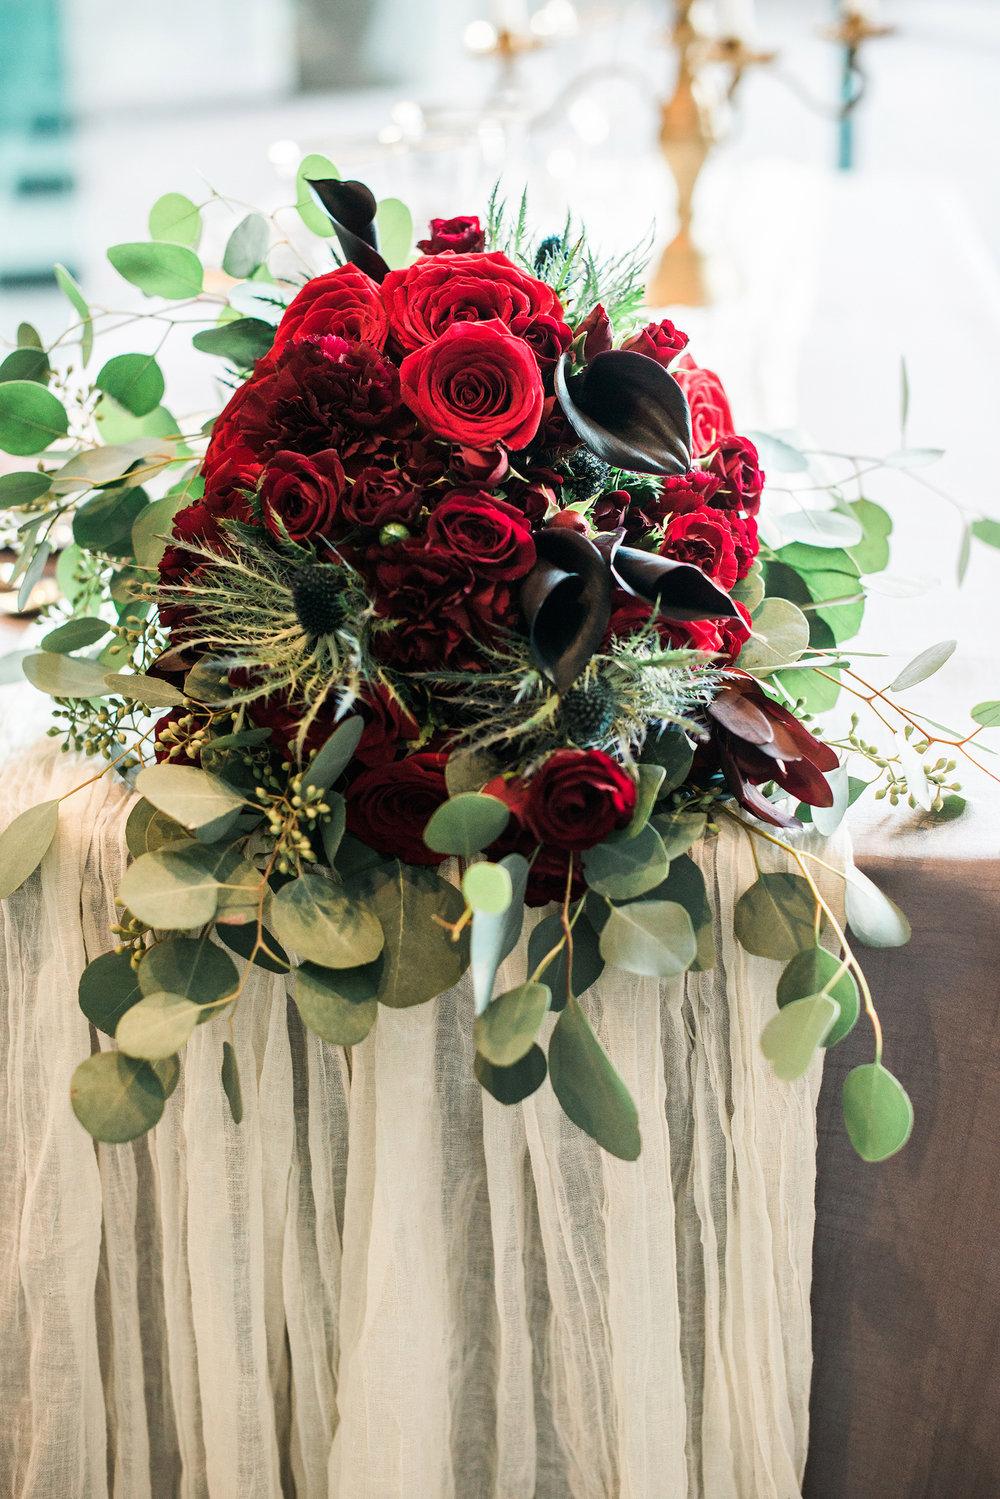 romantic-vintage-wedding-urban-venue-bouquet-1.jpg